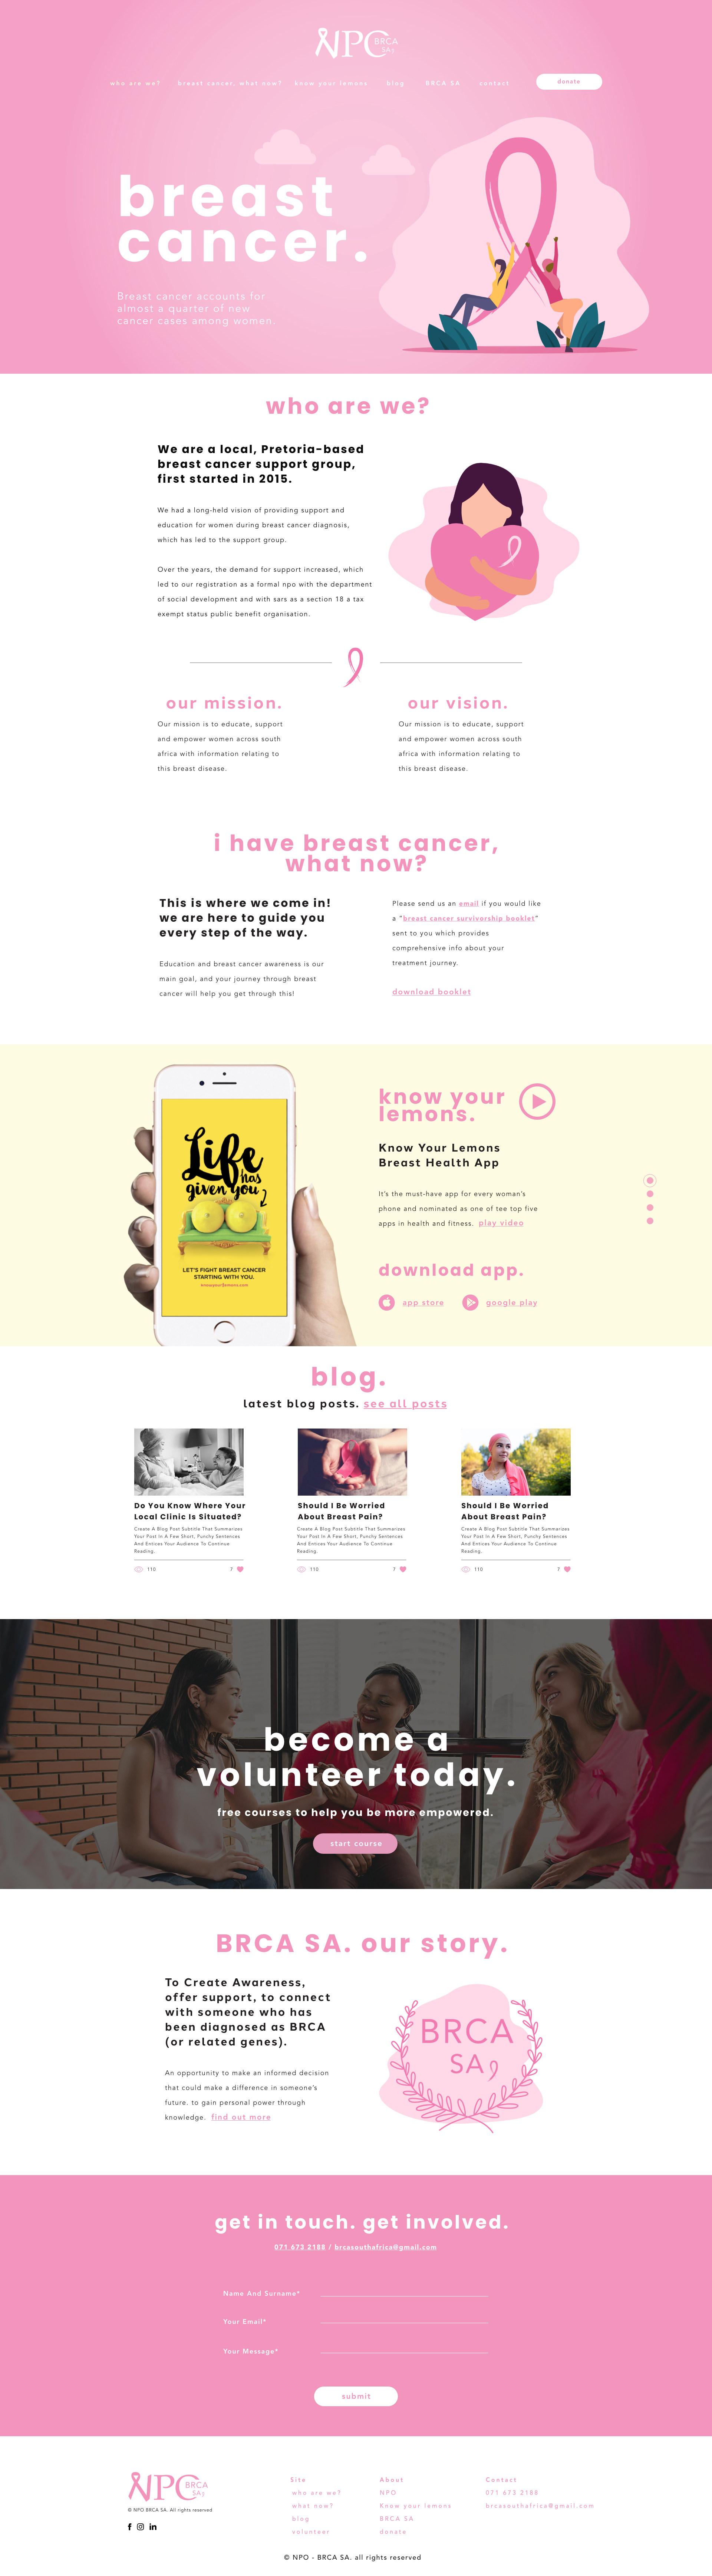 NPO website redesign